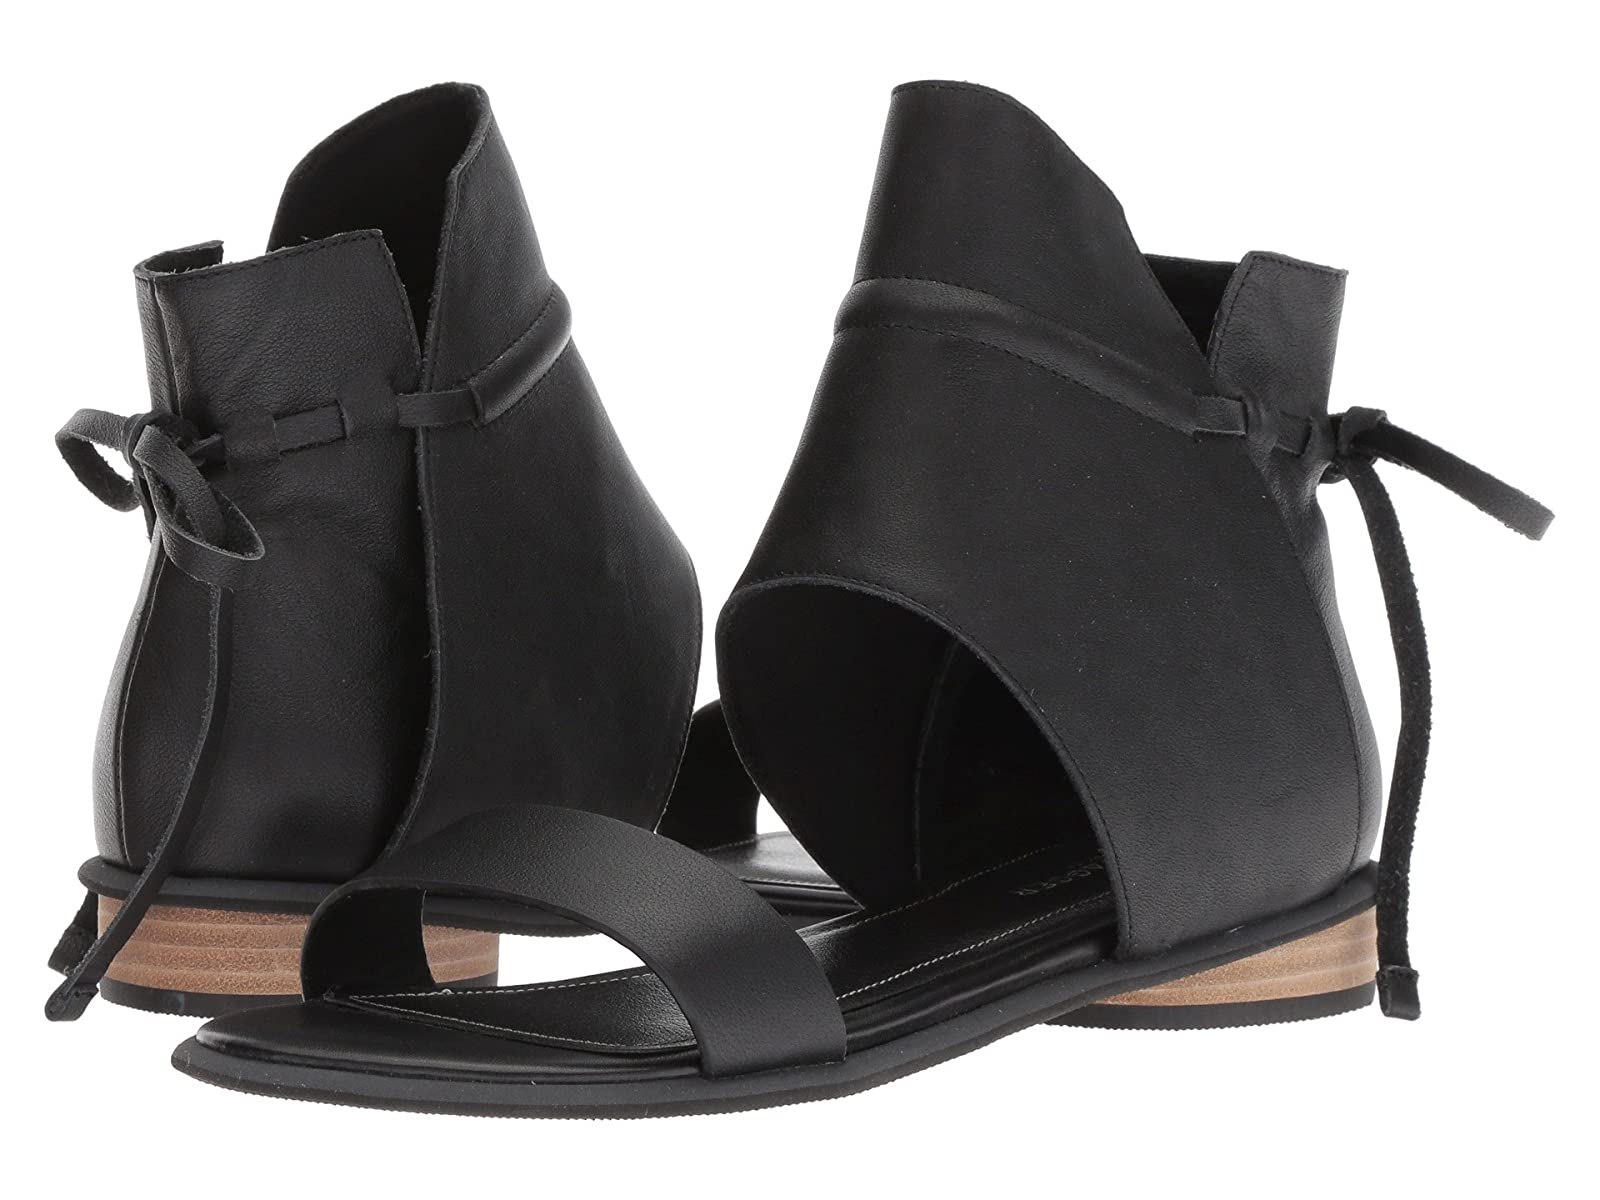 Kelsi Dagger Brooklyn ShaeAtmospheric grades have affordable shoes